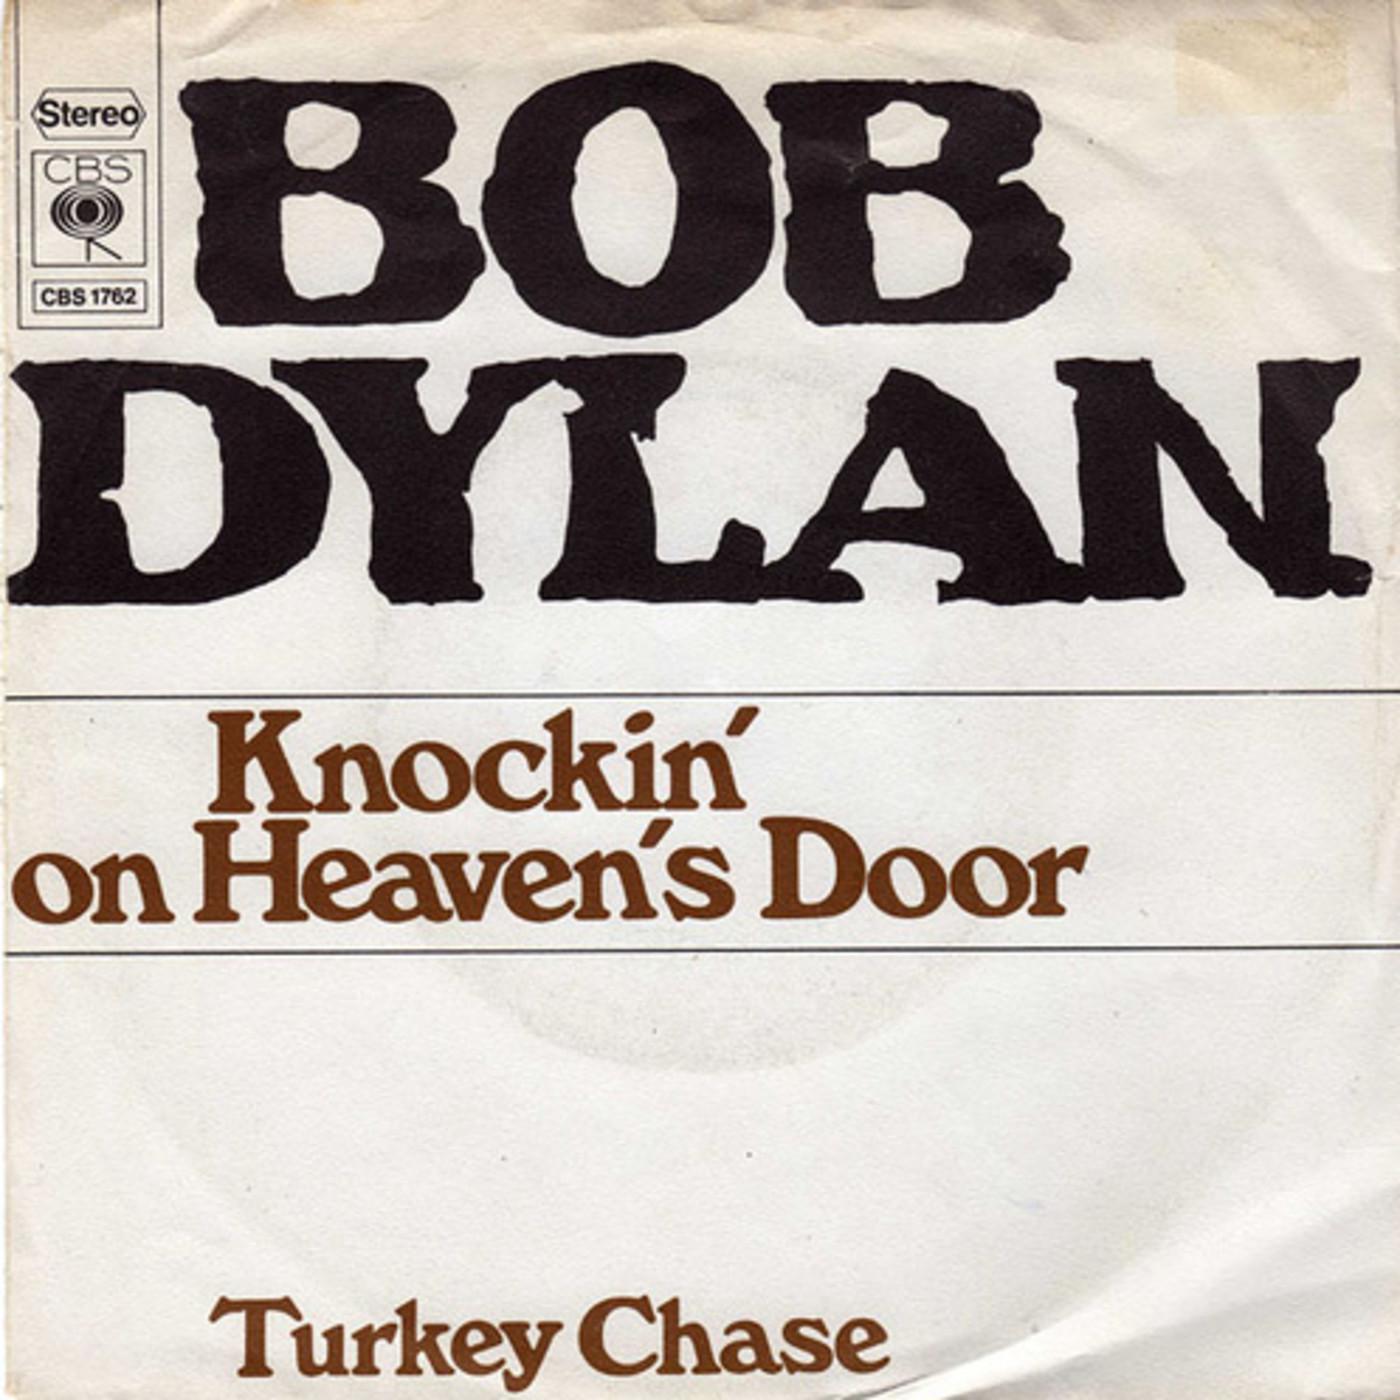 Knockin\u0027 on Heaven\u0027s Door (song) | Lana Del Rey Wiki | FANDOM powered by Wikia